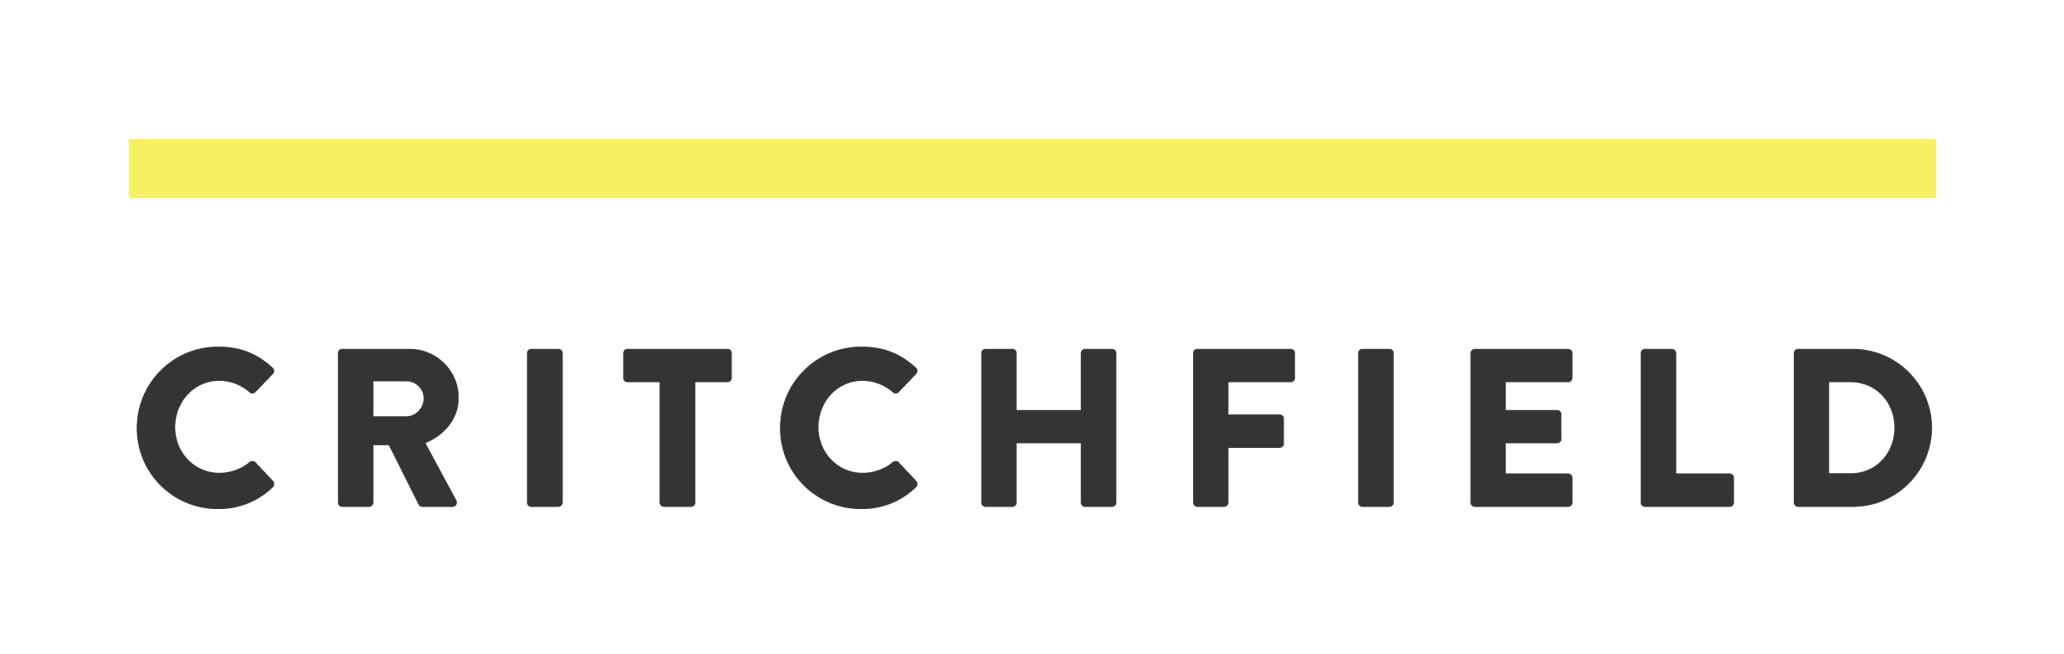 Critchfield Logo 1